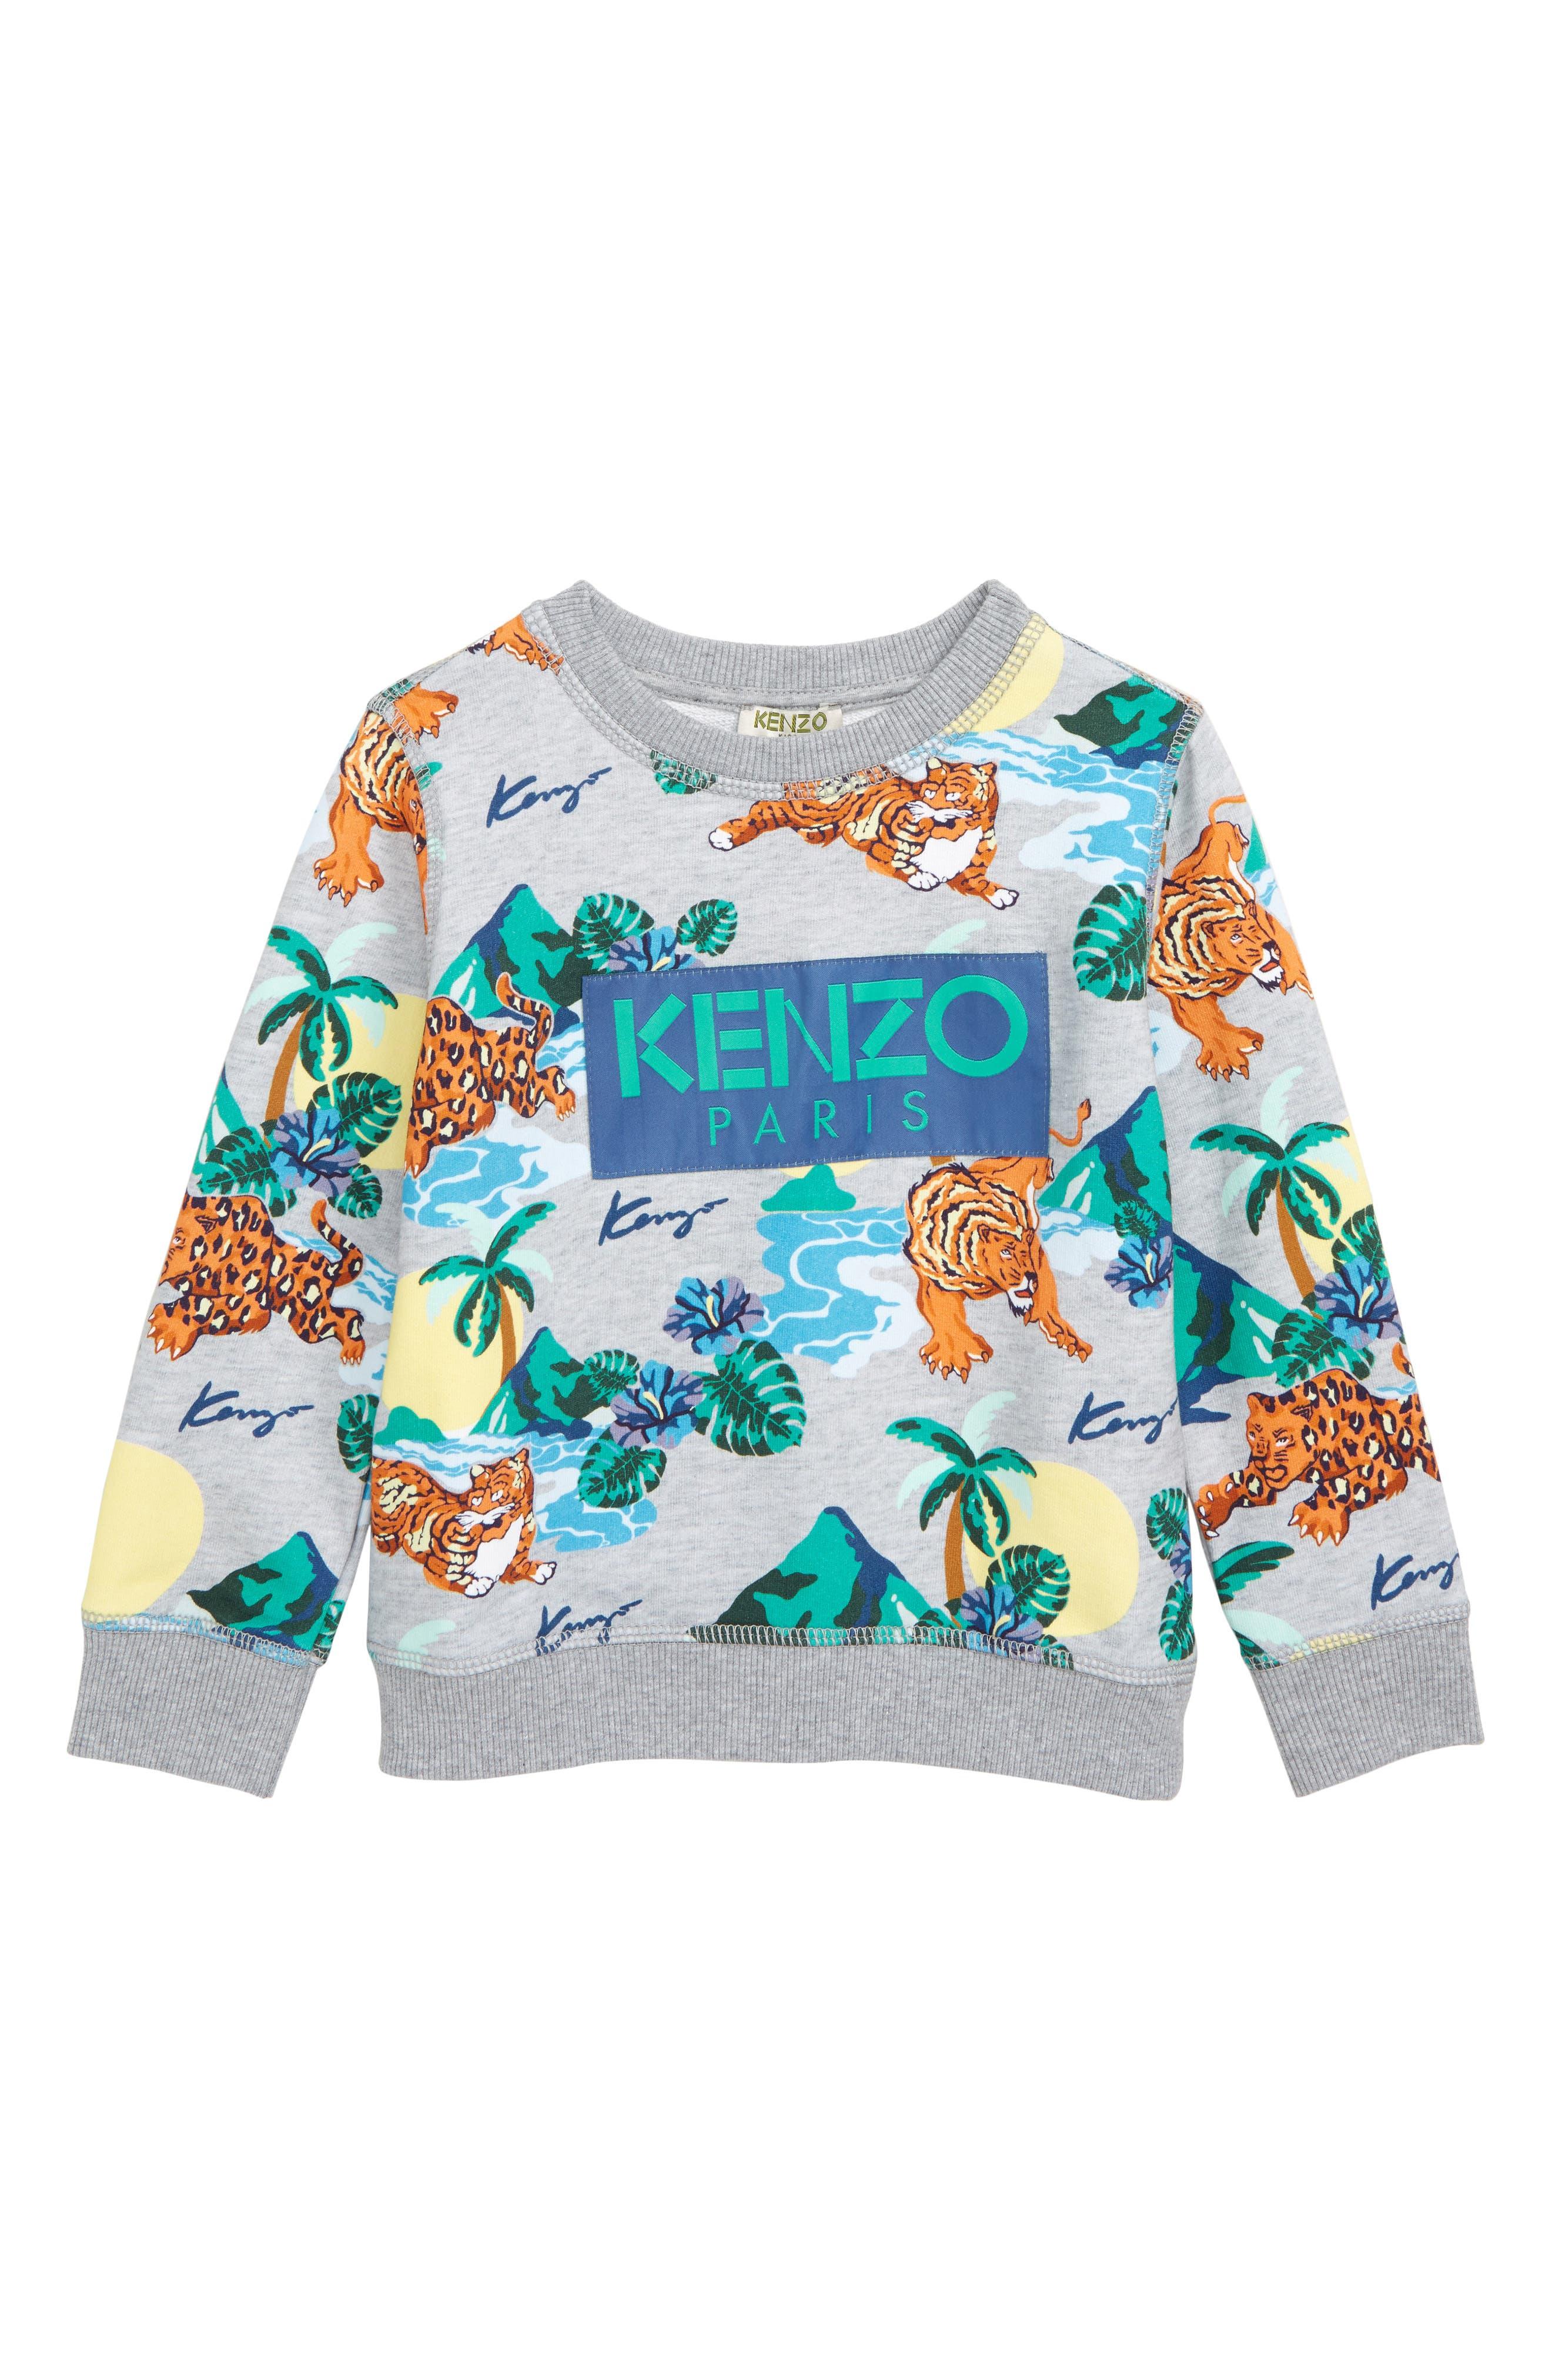 KENZO Tropical Print Sweatshirt, Main, color, MARL GREY